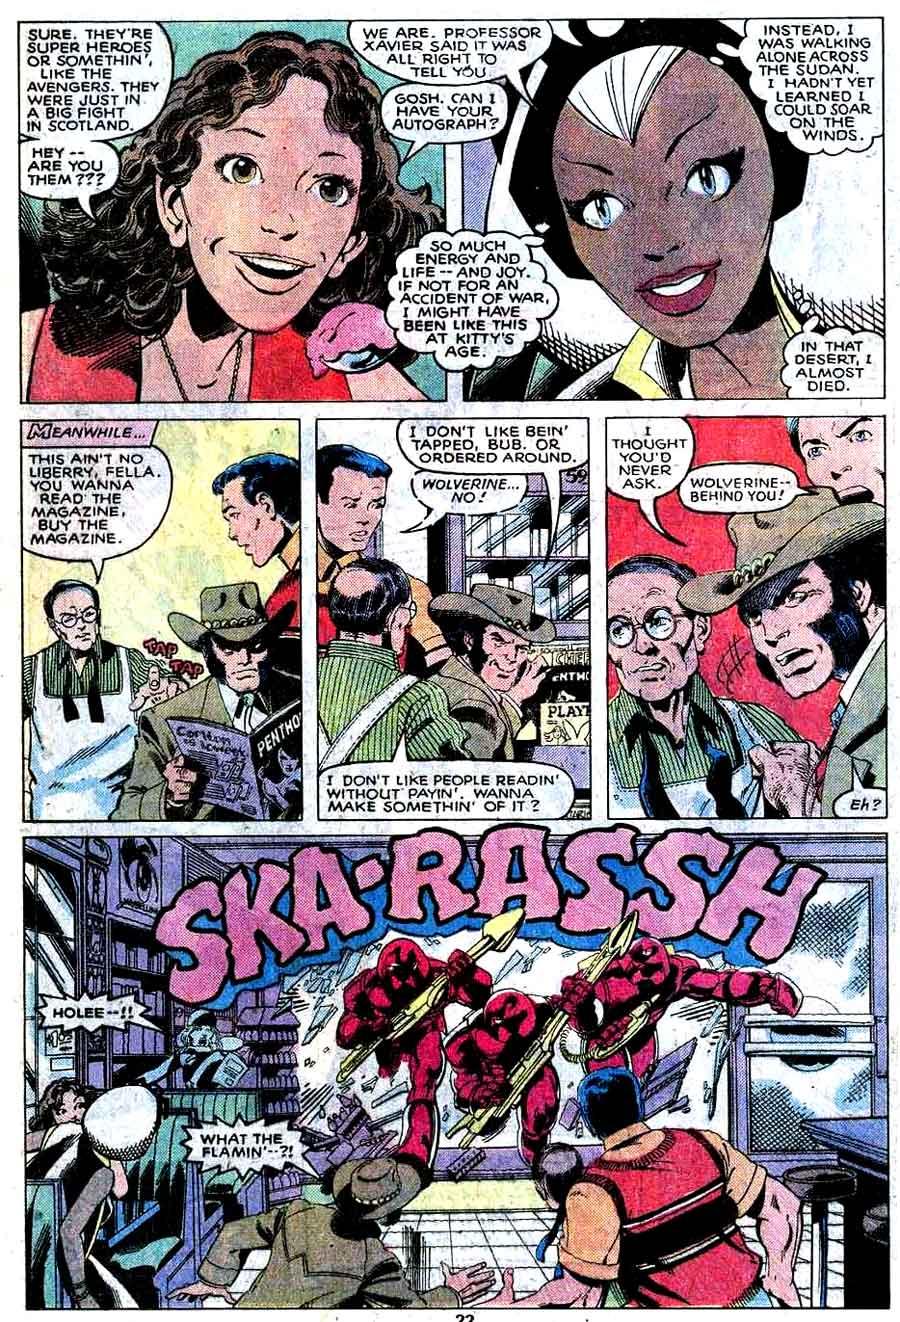 X-men v1 #129 marvel comic book page art by John Byrne